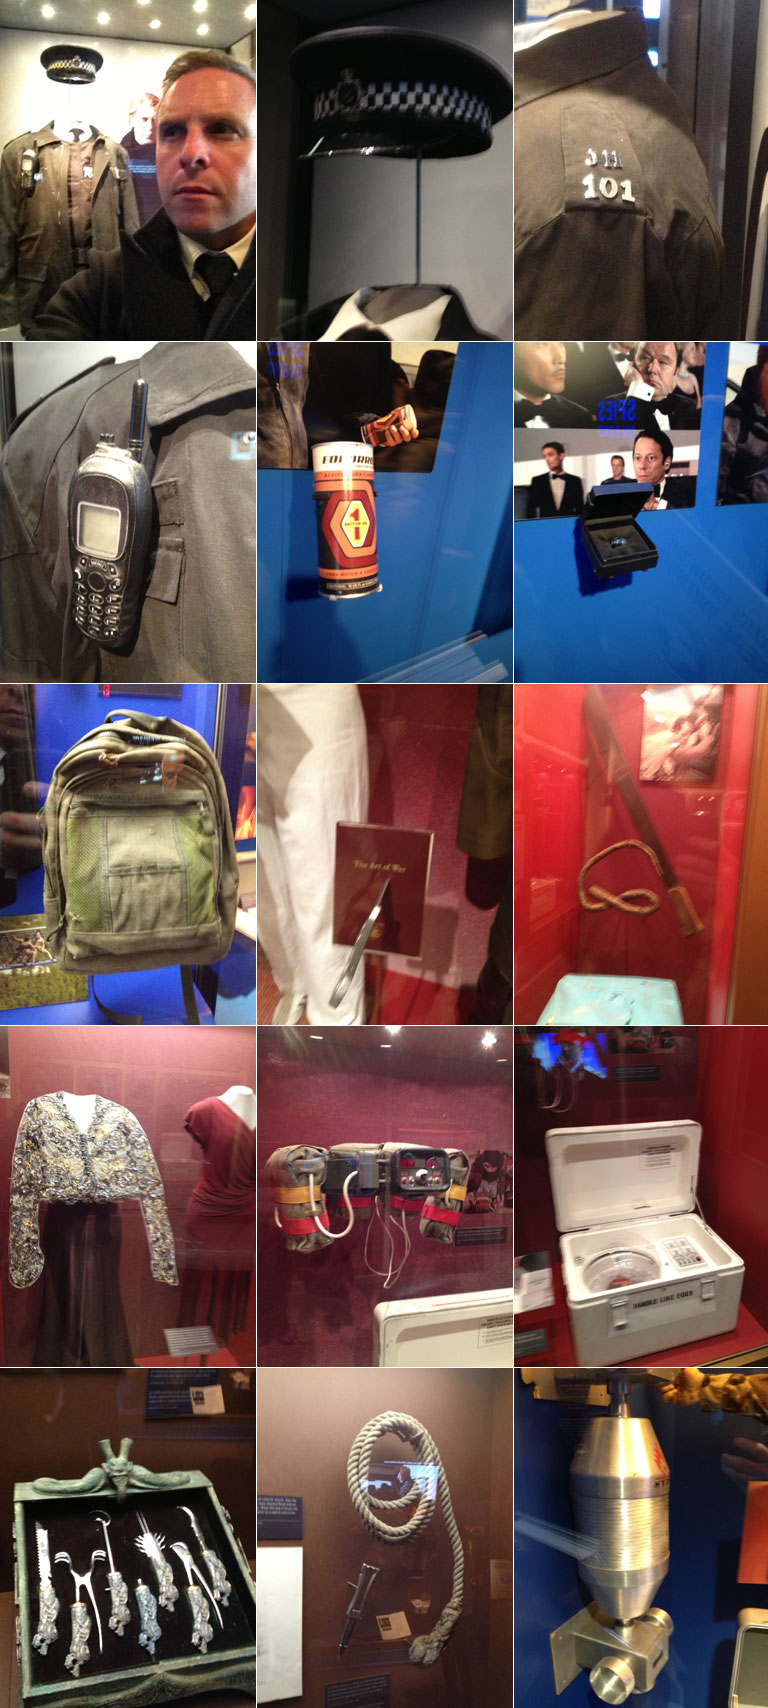 james bond at the international spy museum